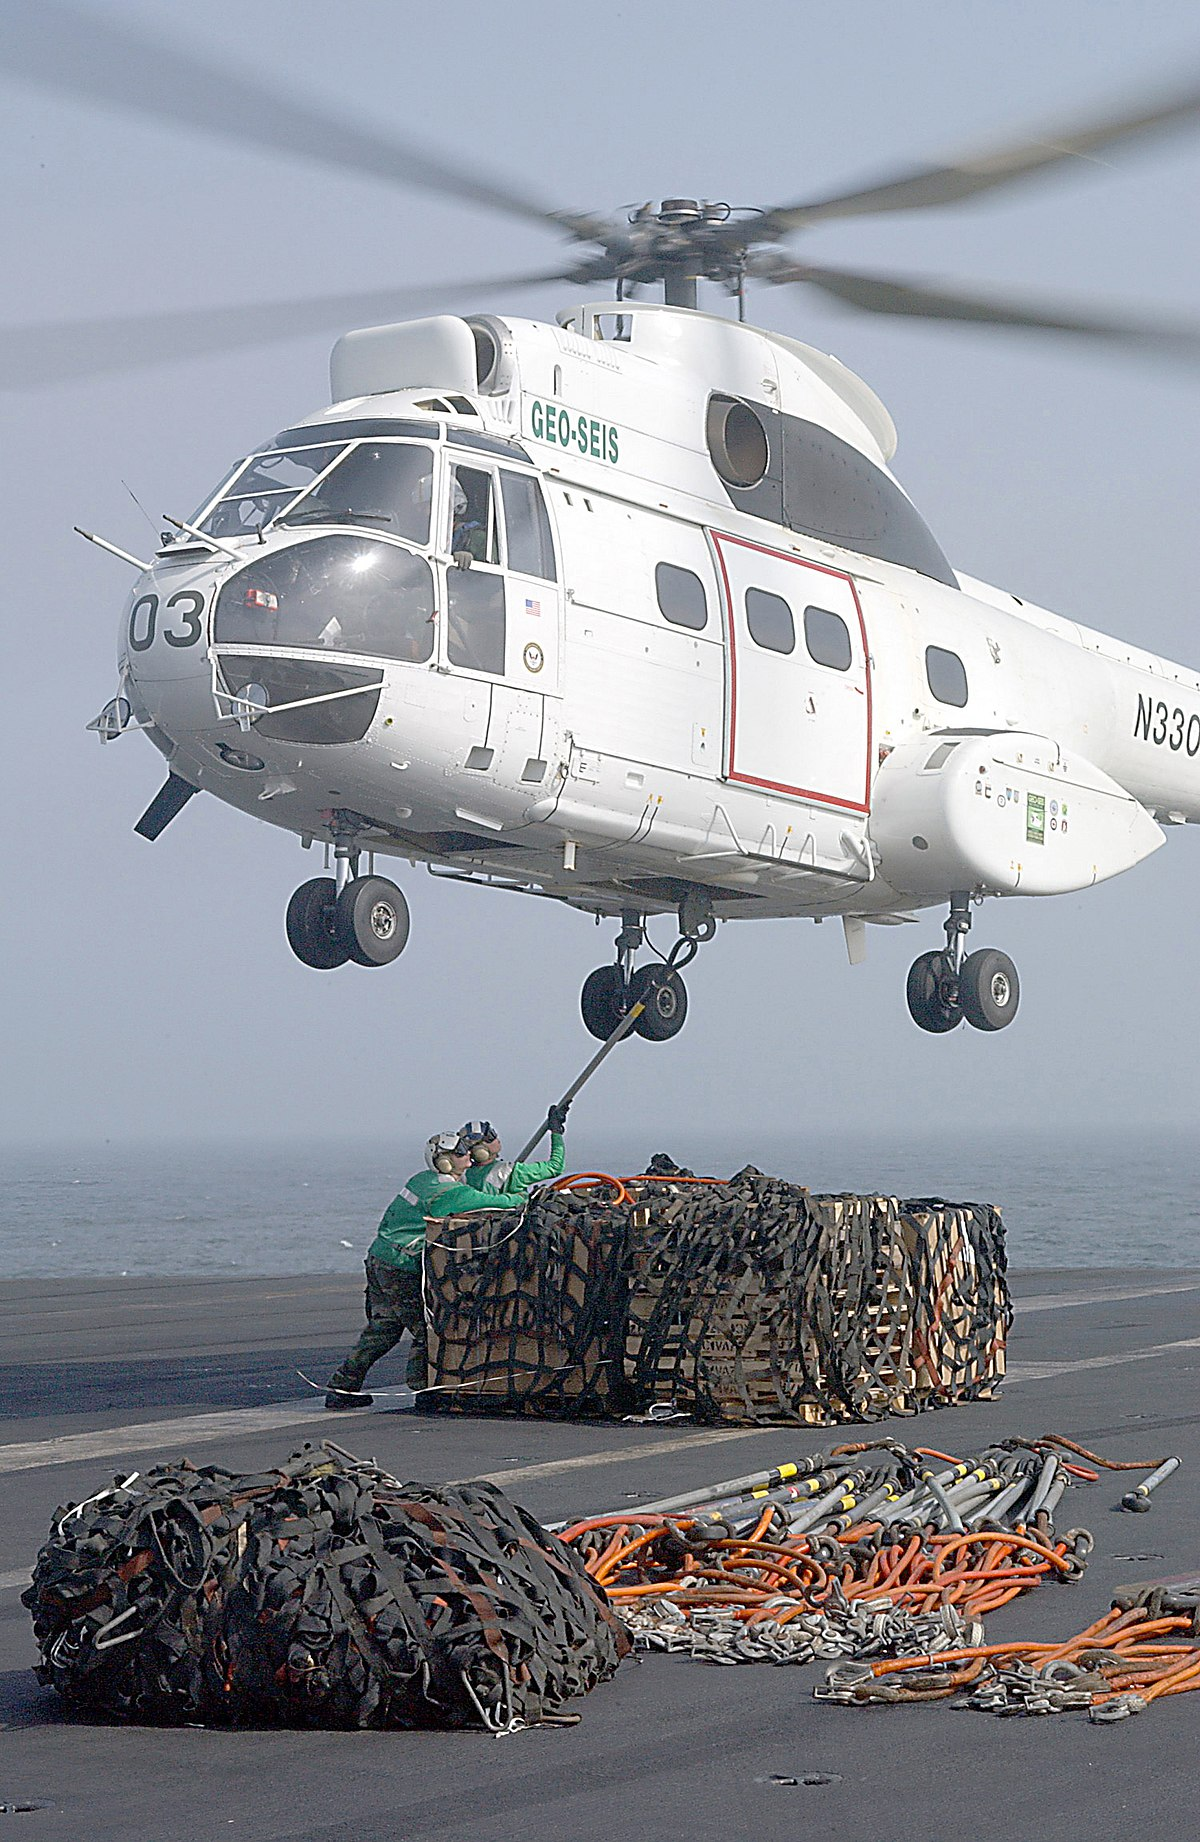 Cargo net - Wikipedia